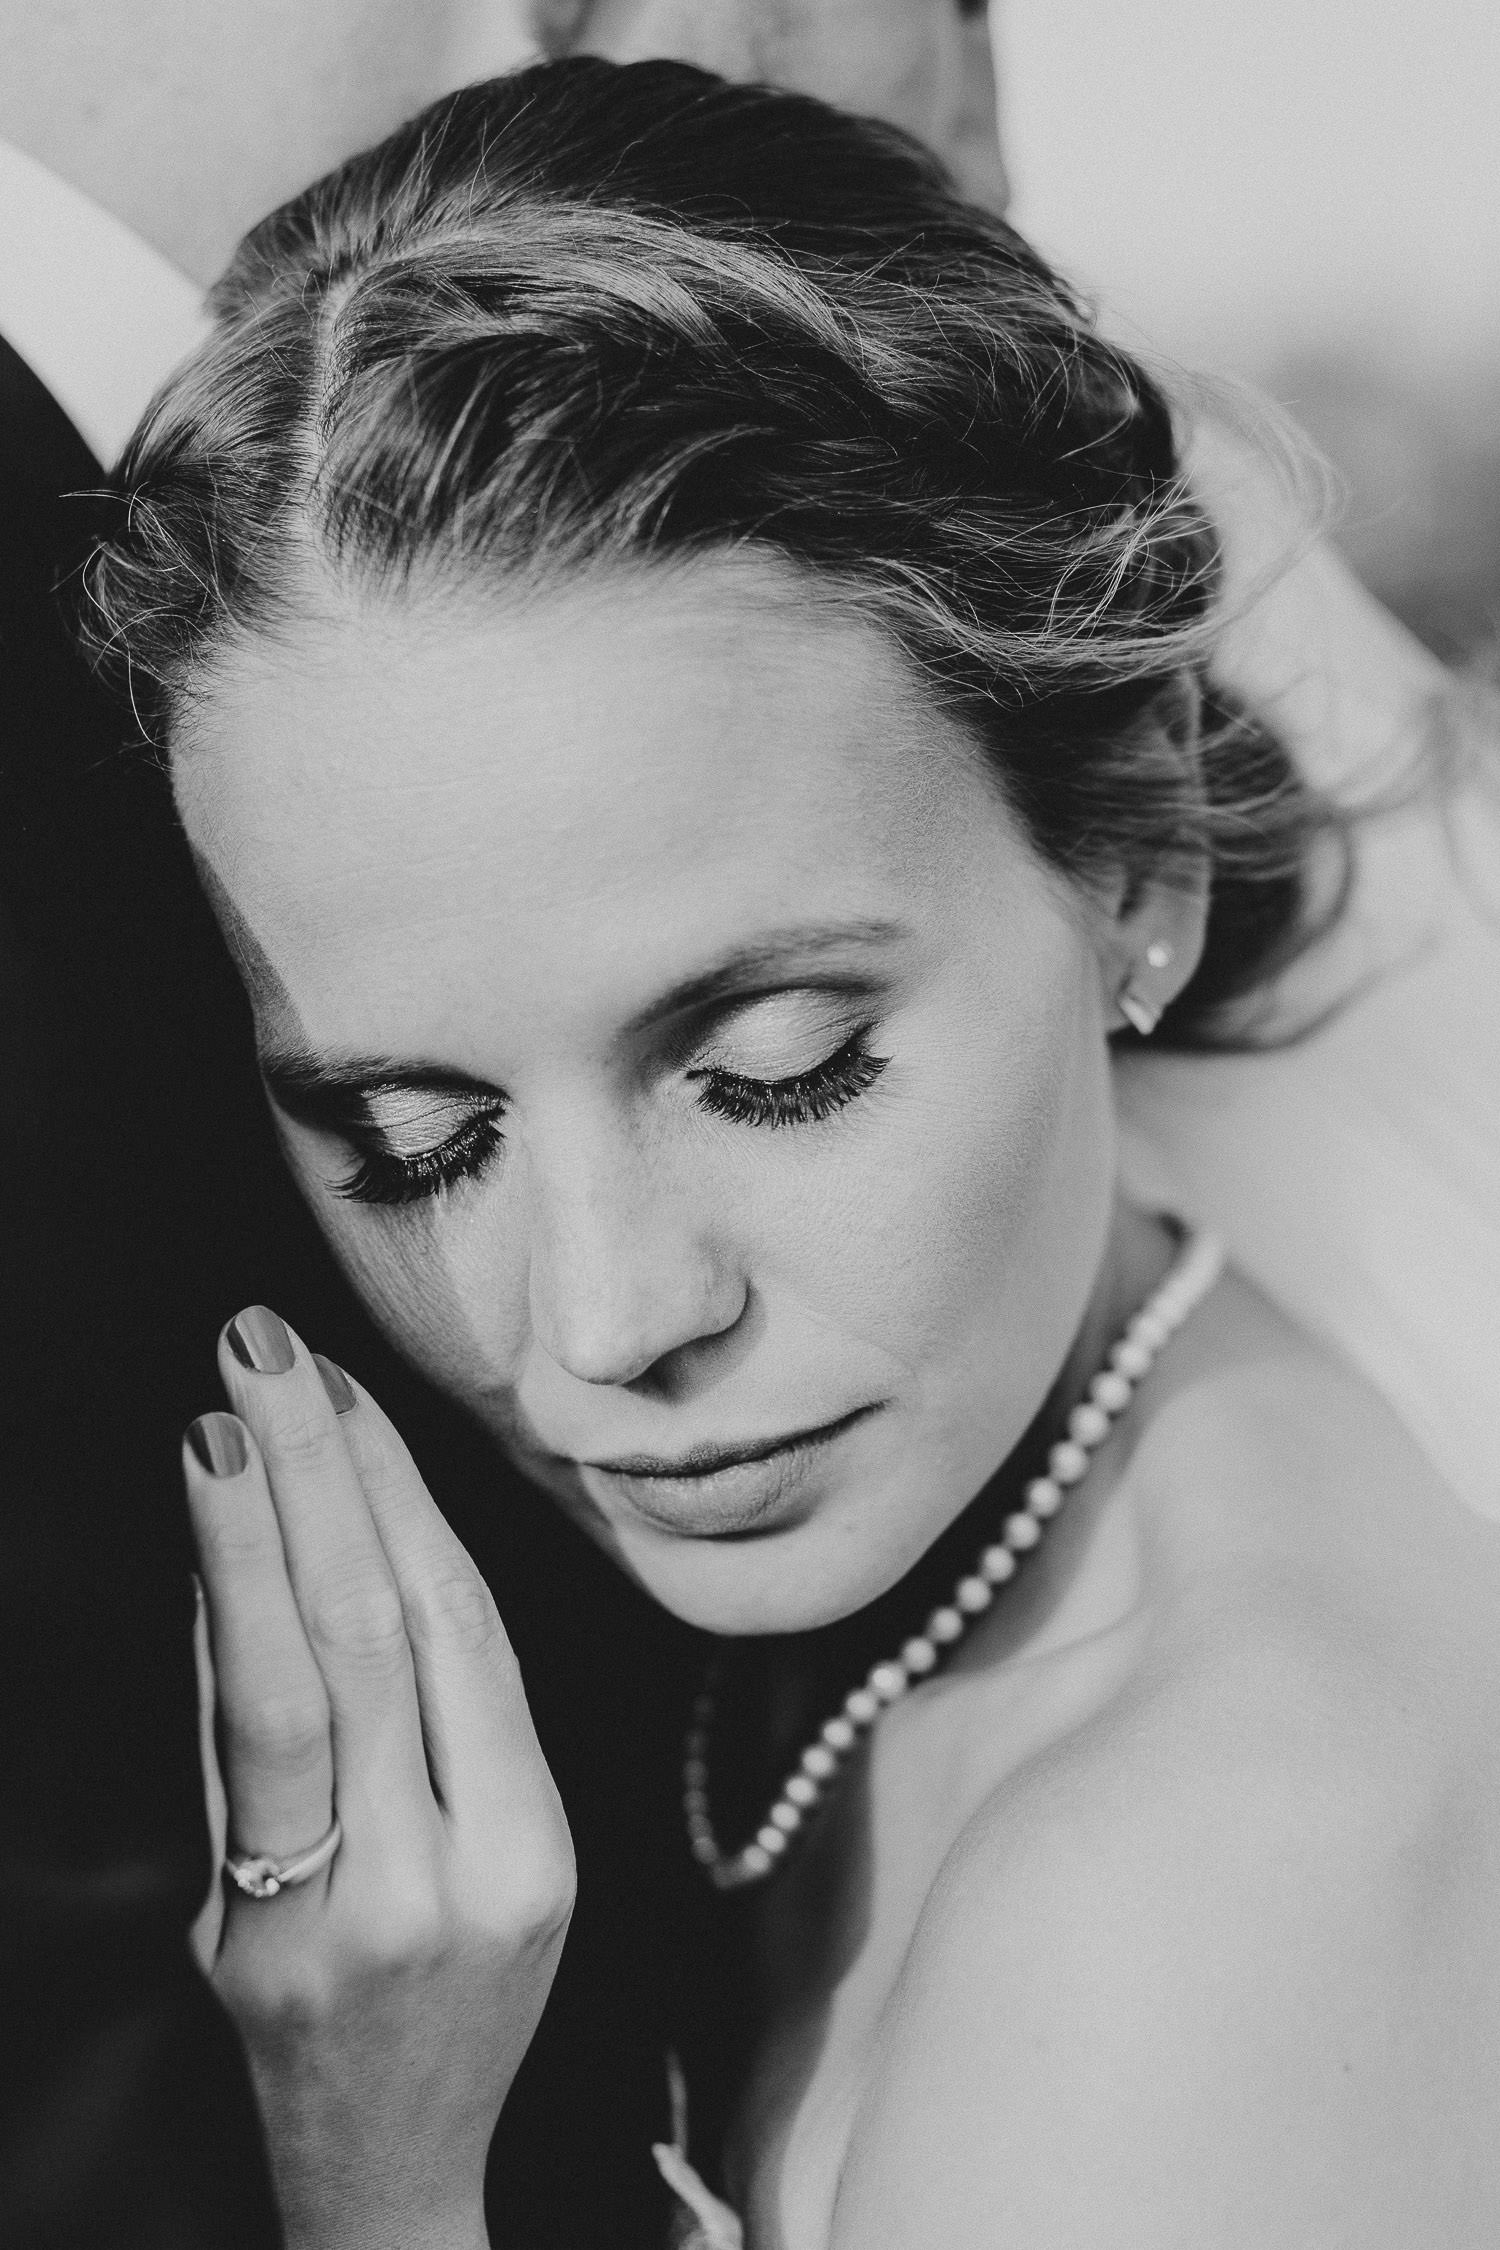 Braut lehnt sich an Brust des Bräutigams